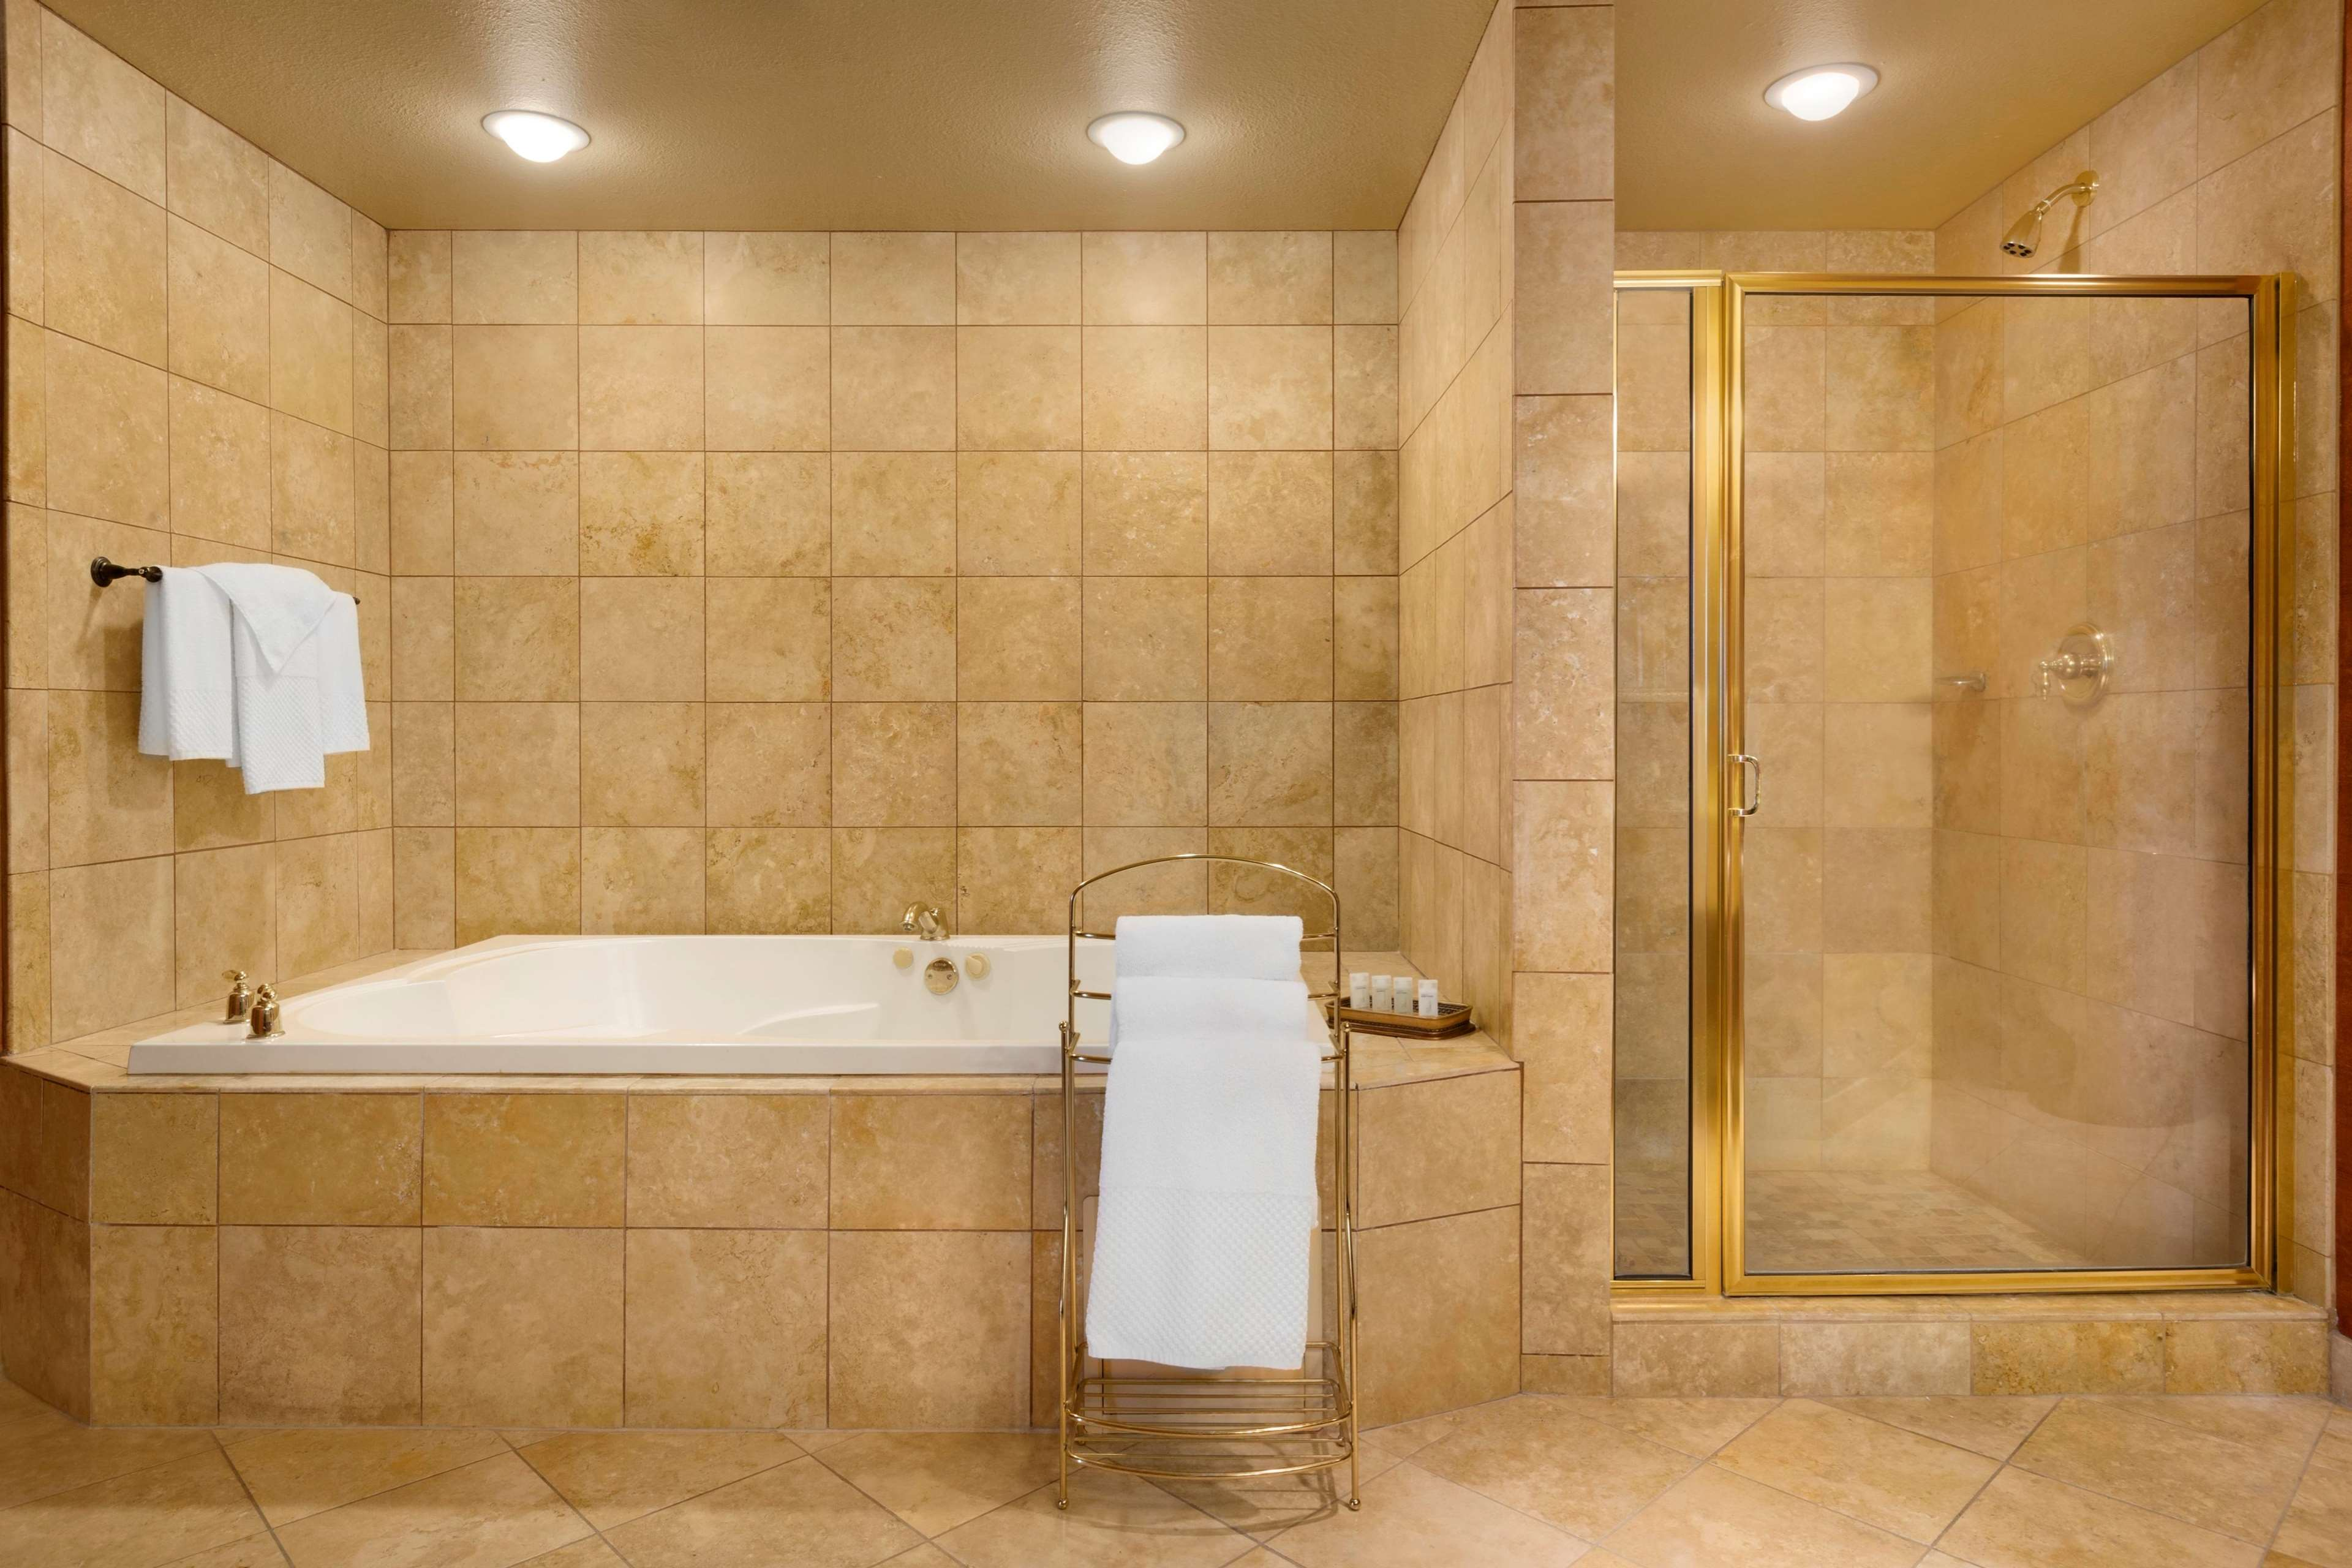 Embassy Suites by Hilton Albuquerque Hotel & Spa image 32